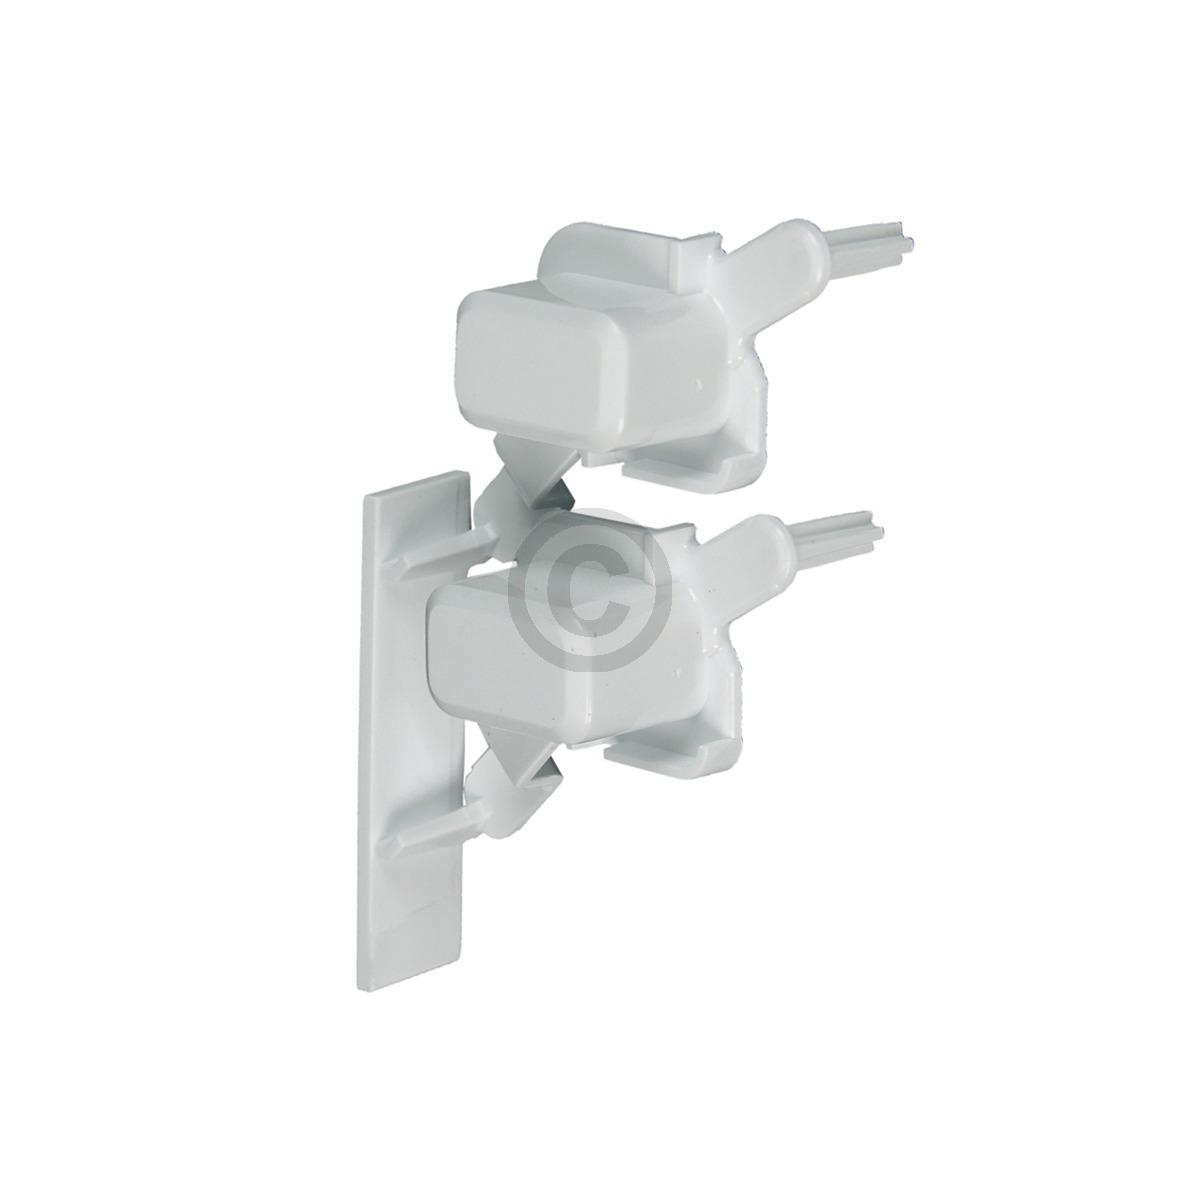 Tastenkappe weiß, 2-fach 481071425541 Bauknecht, Whirlpool, Ikea